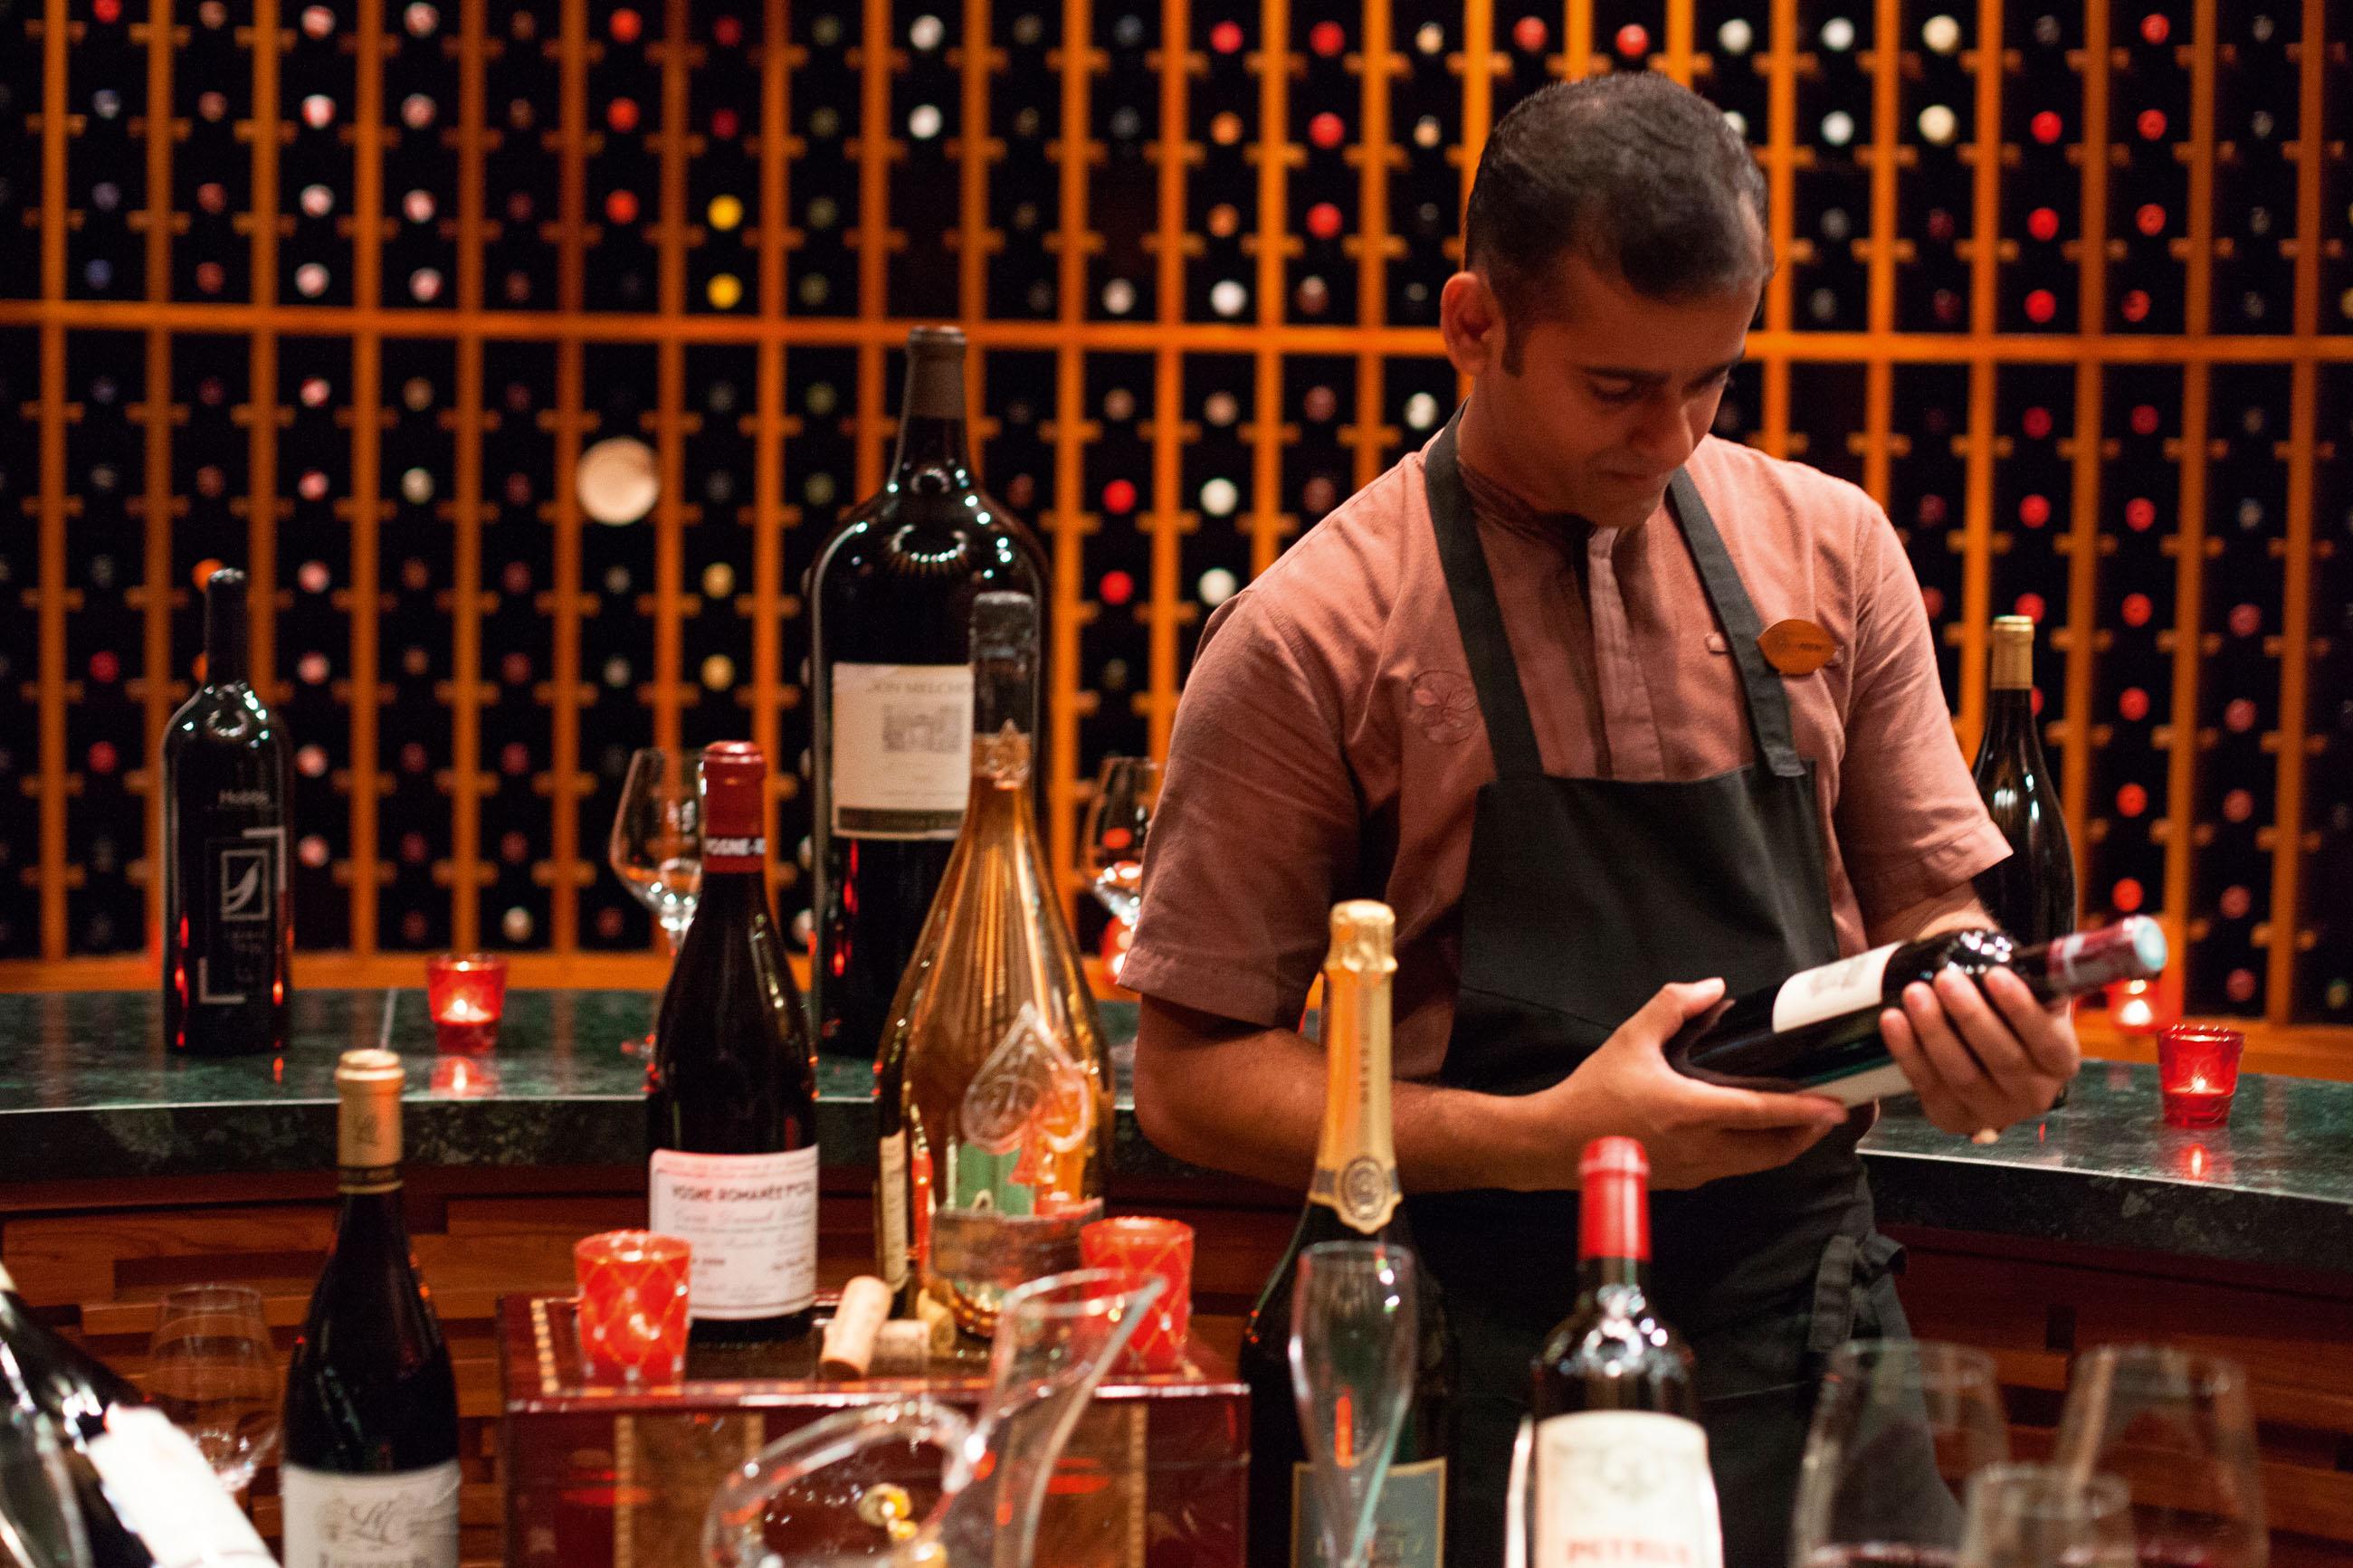 https://bubo.sk/uploads/galleries/16372/halaveli-maldives-2016-wine-cellar-03_hd-33.jpg